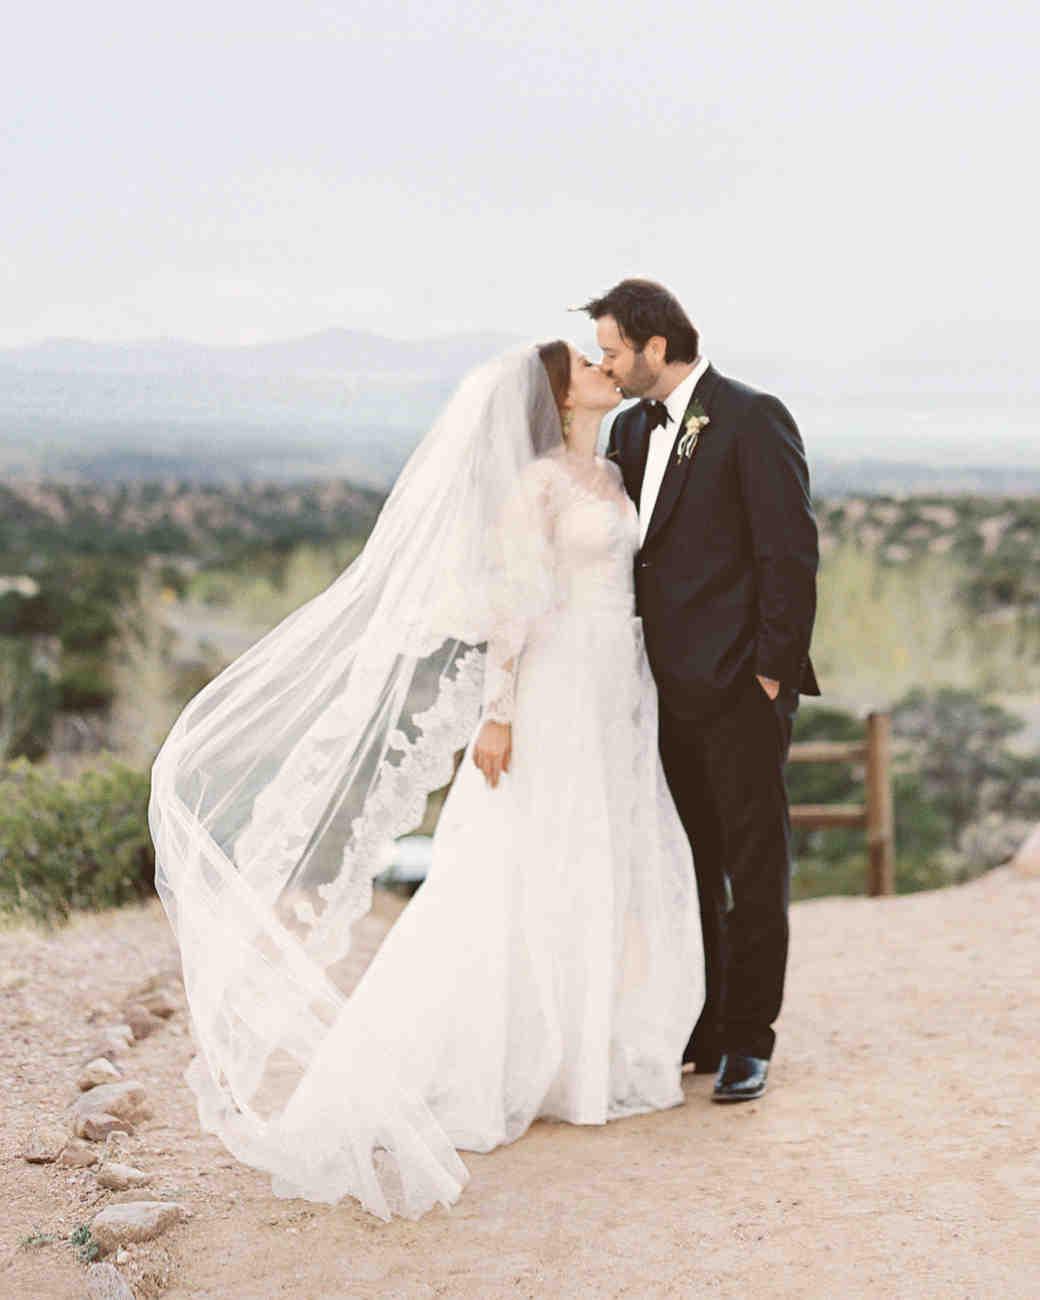 katherine-jared-wedding-0741-ds111387.jpg